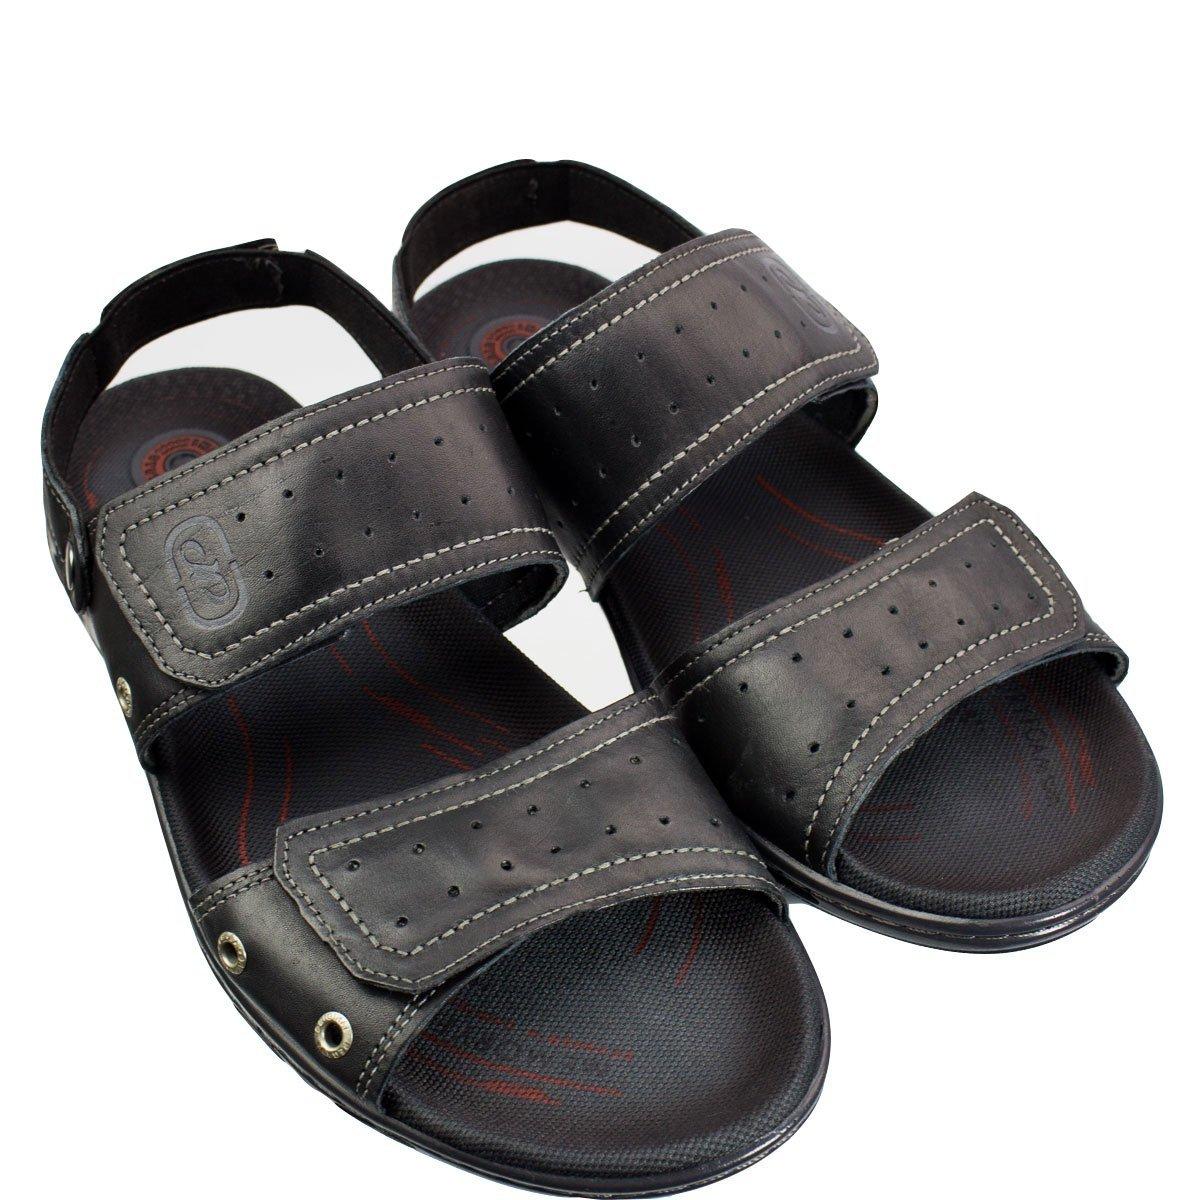 Plus 05 Preto Pegada Size Sandália Plus Sandália 530612 Masculina 8xwx1BEq